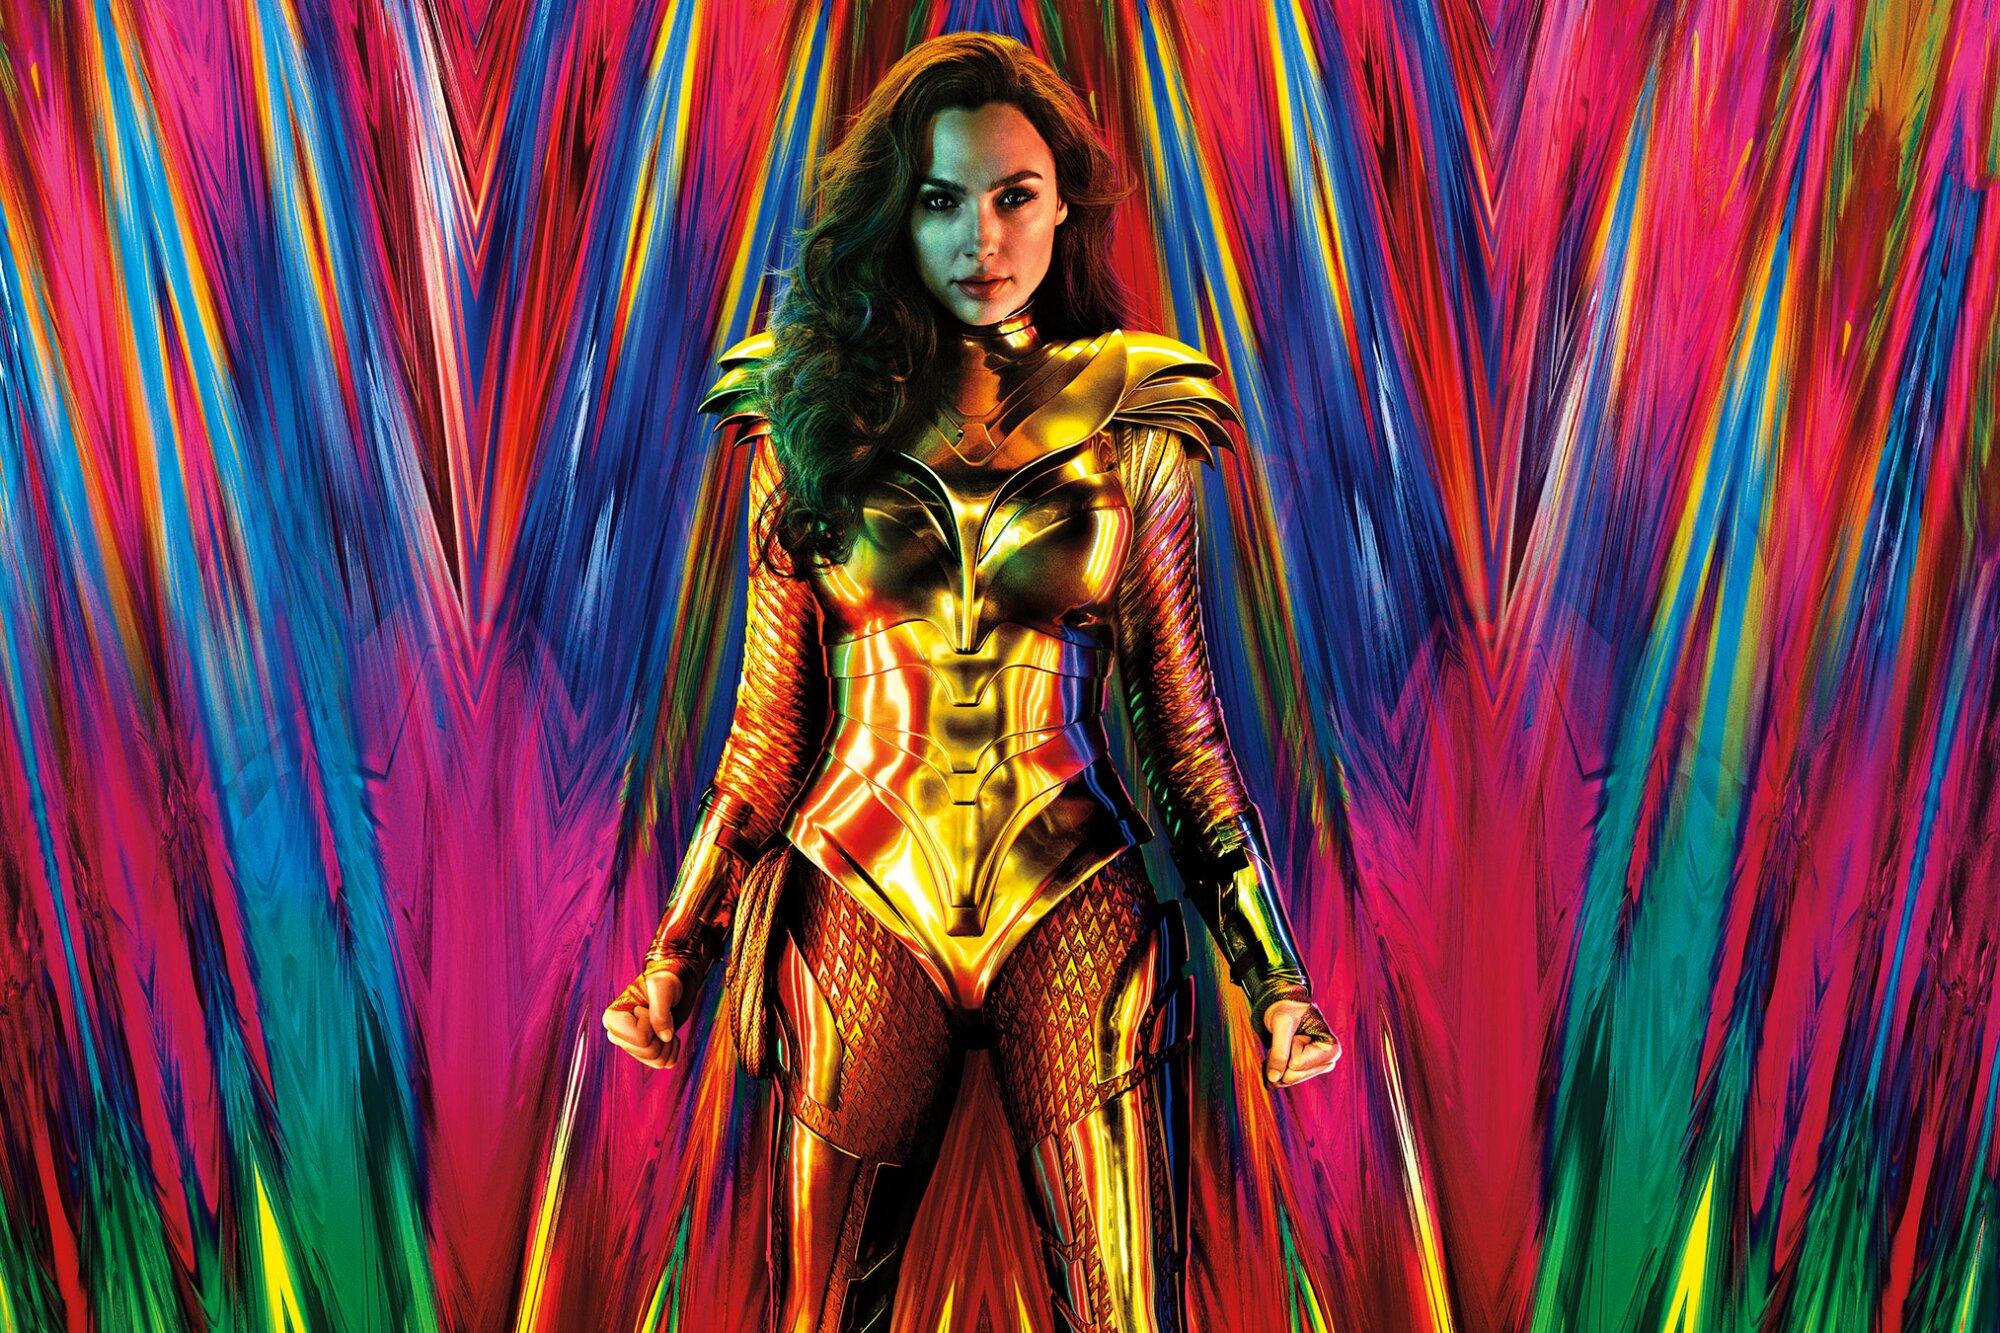 Gal Gadot as Wonder Woman in her gold armor